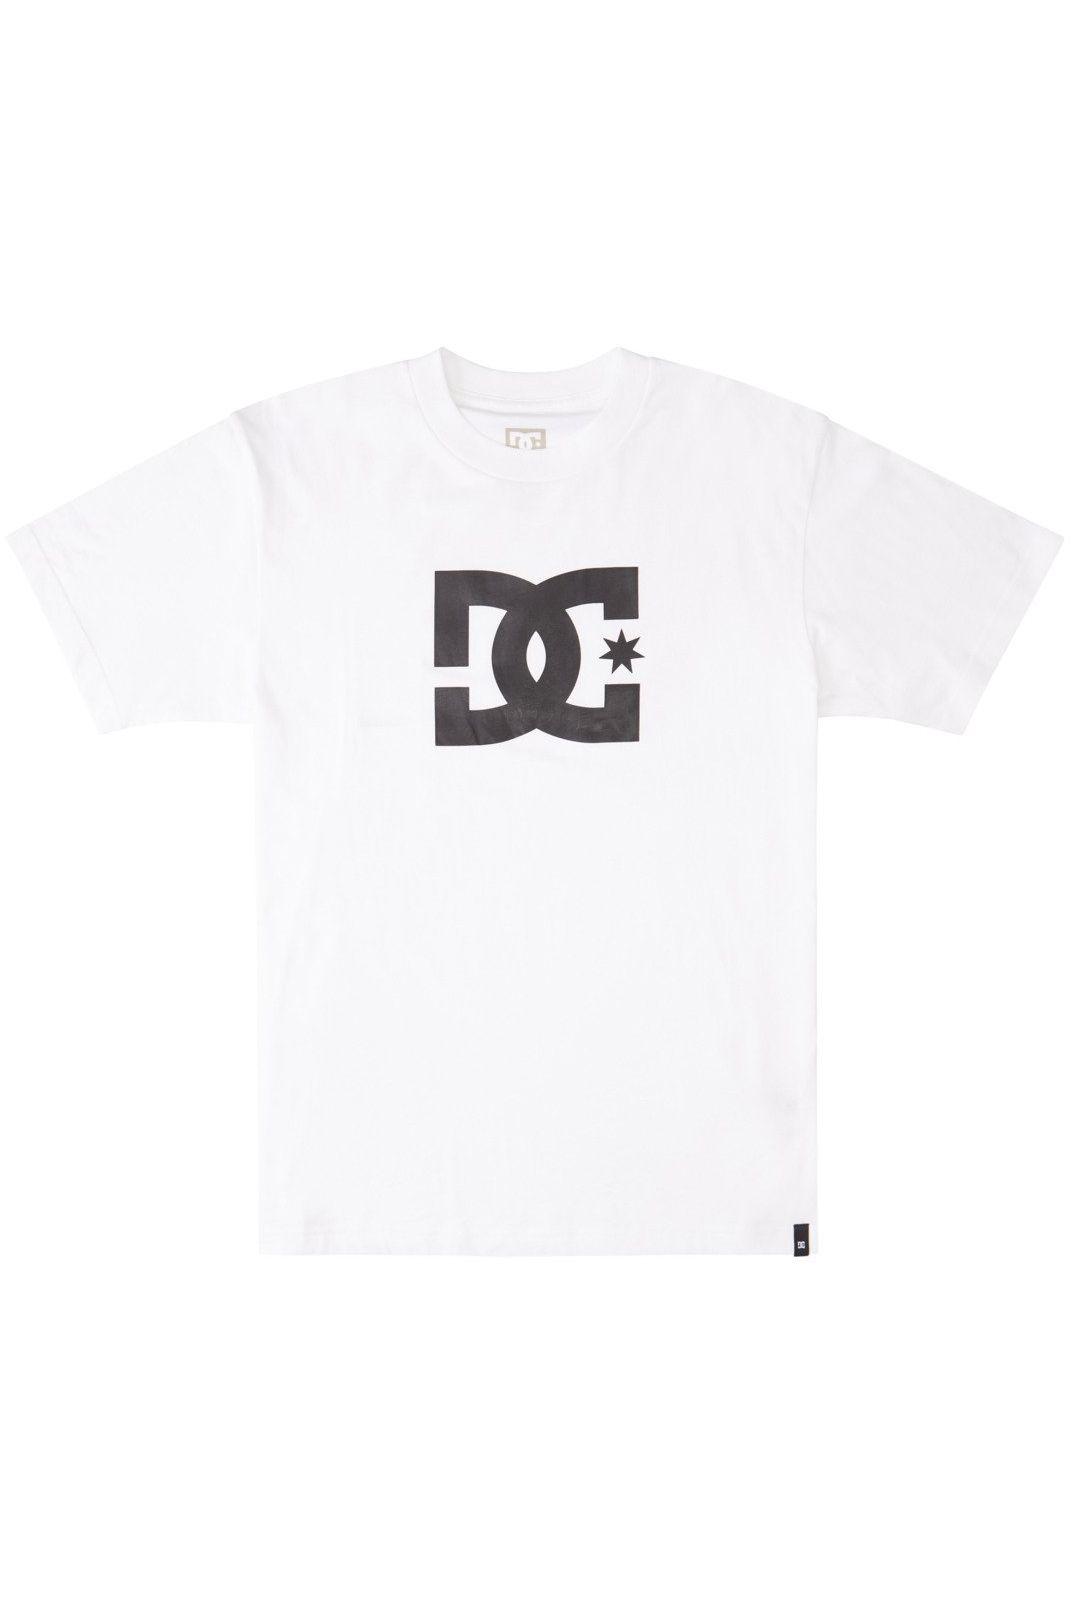 T-Shirt DC Shoes DC STAR HSS White